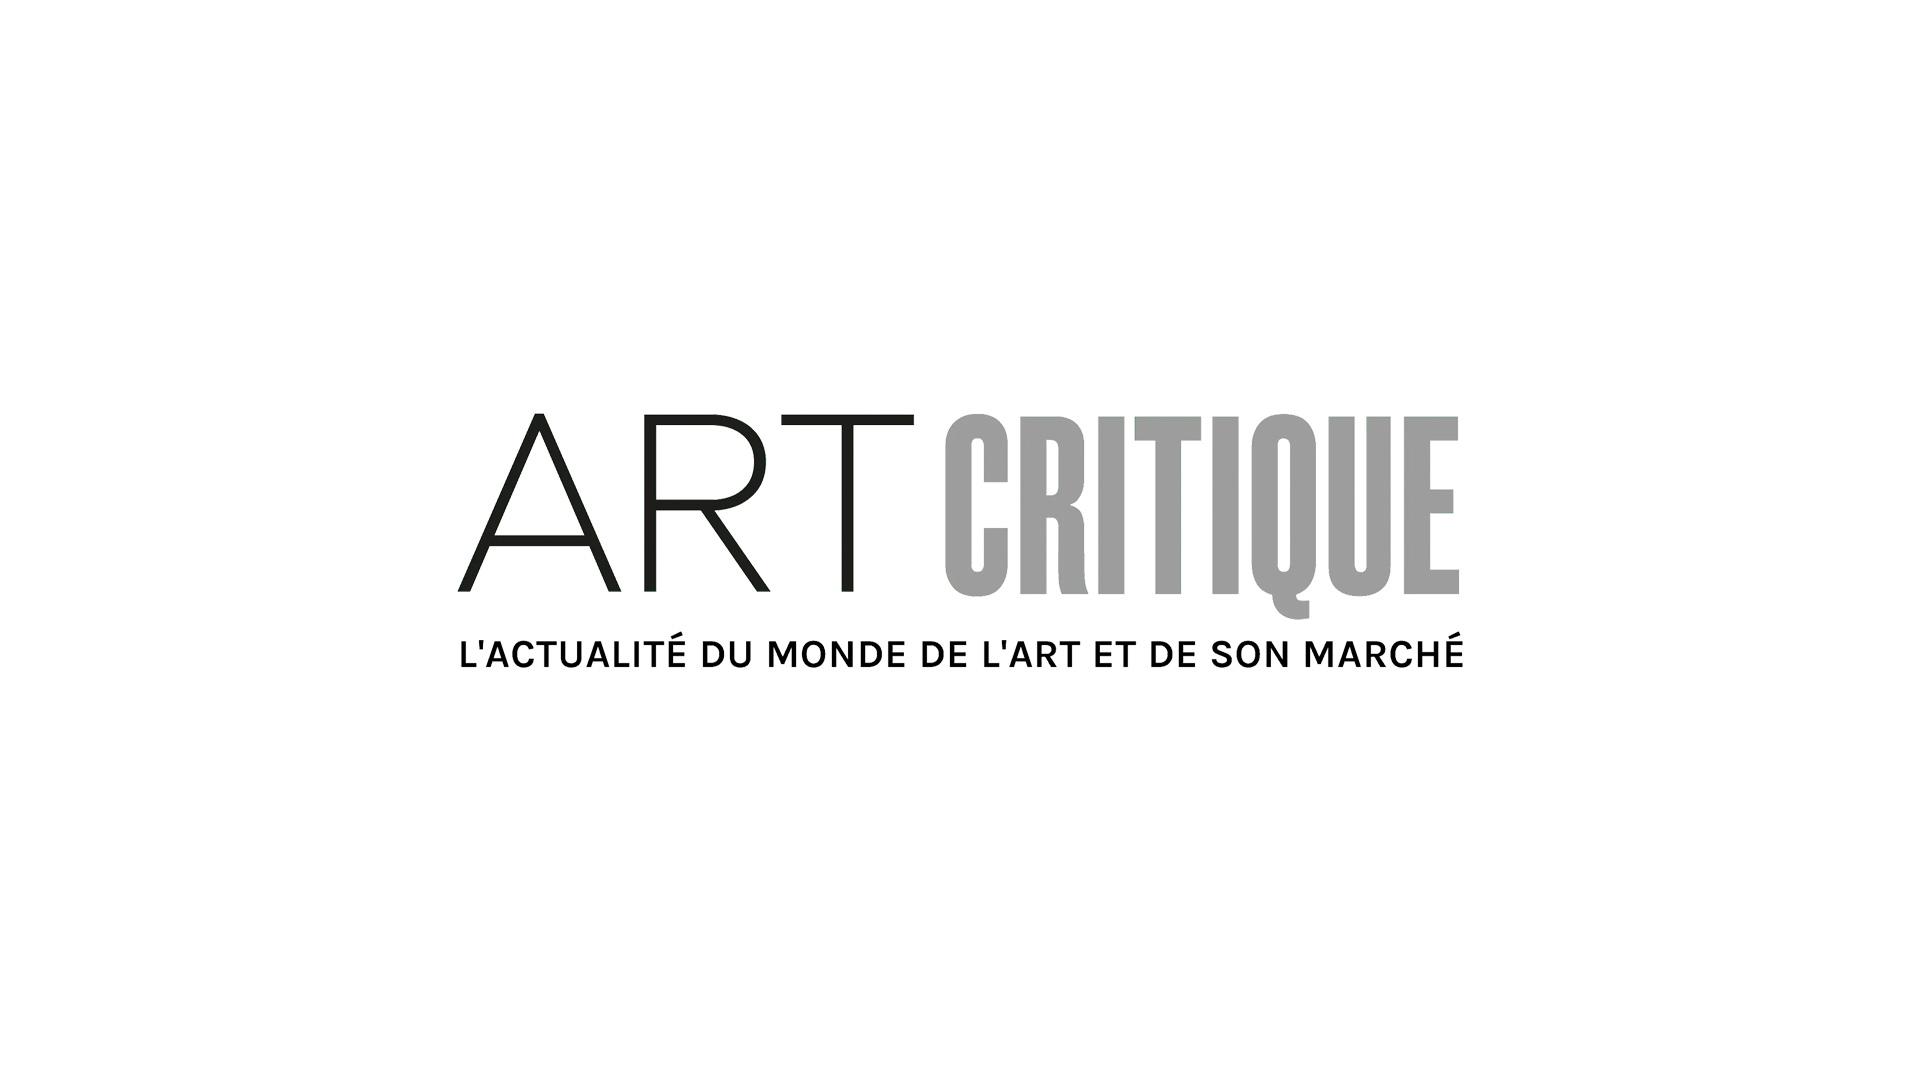 Artist Frank Bowling, 86, knighted by Queen Elizabeth